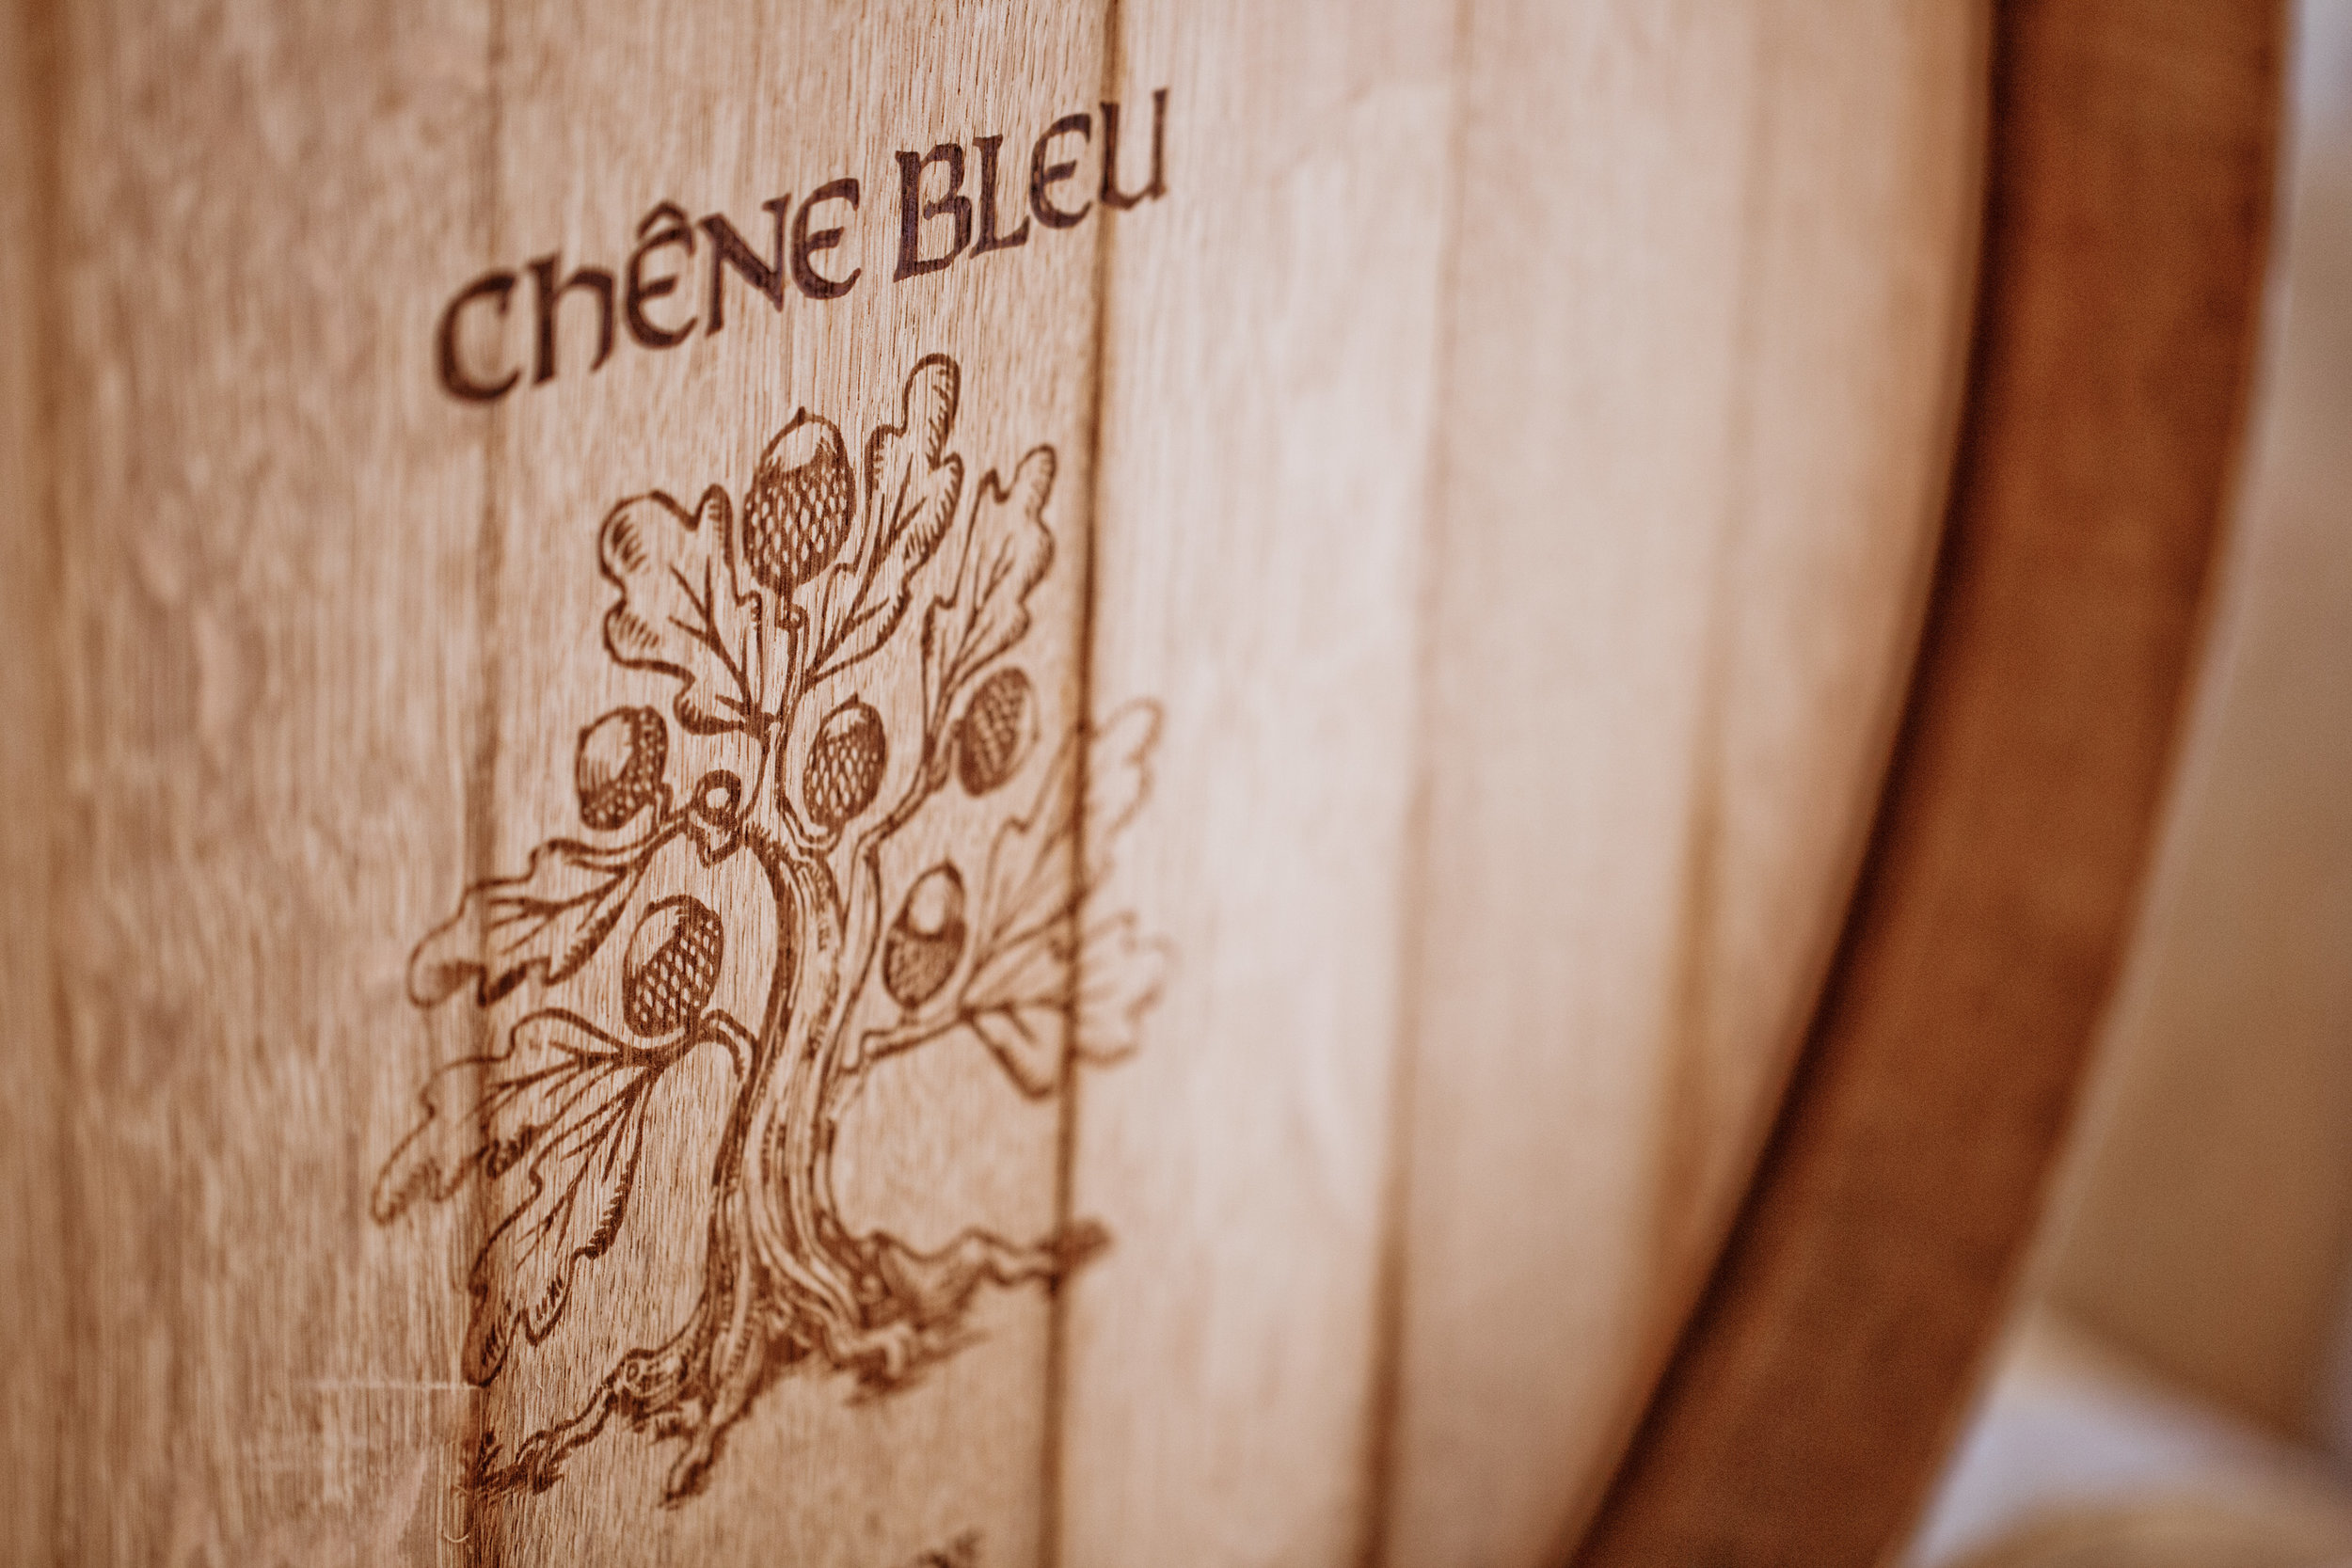 Chene Blue barrel